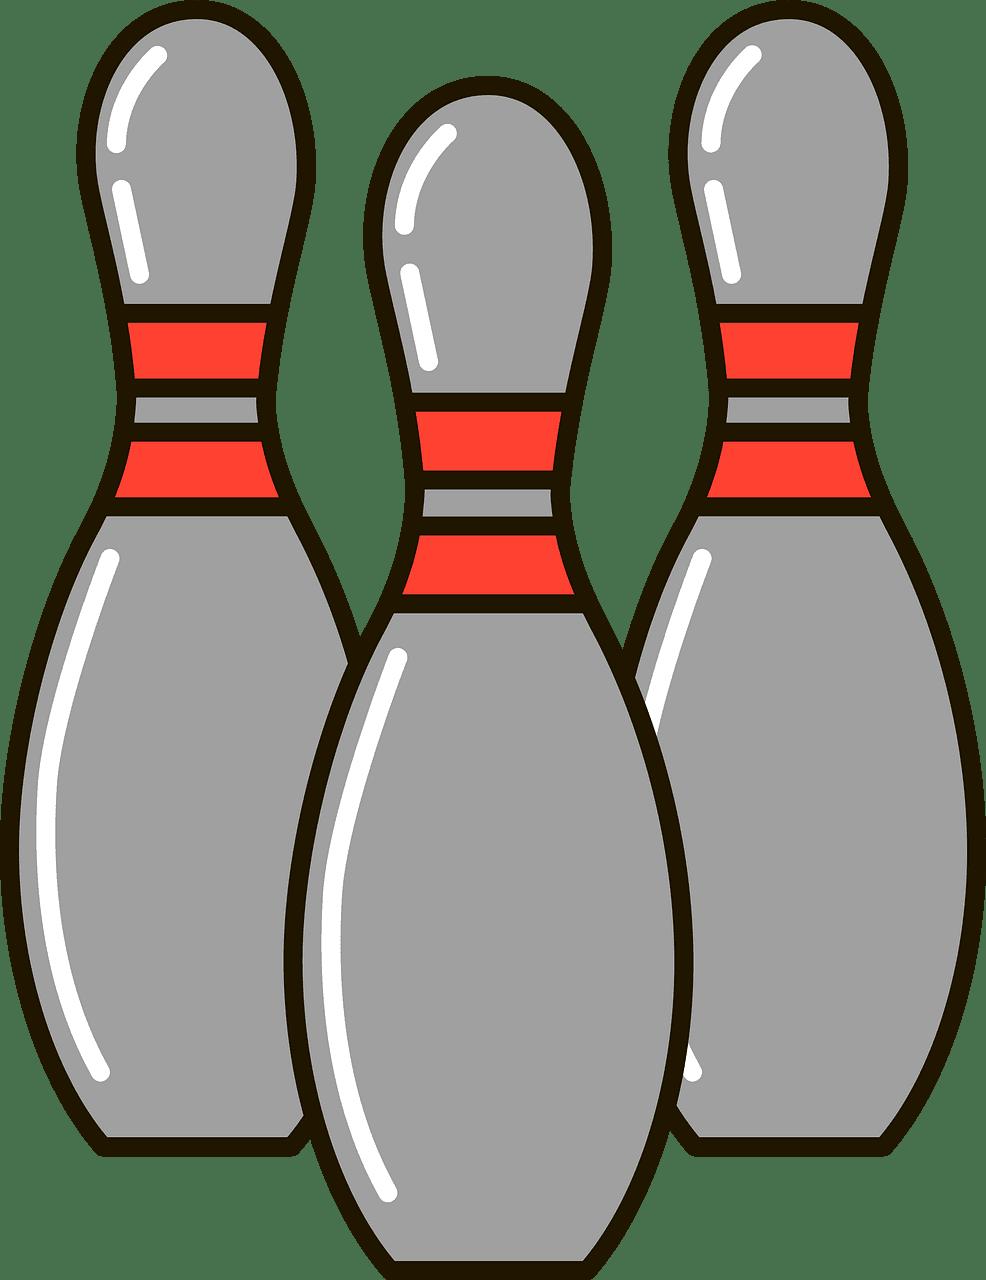 Bowling Pins clipart transparent